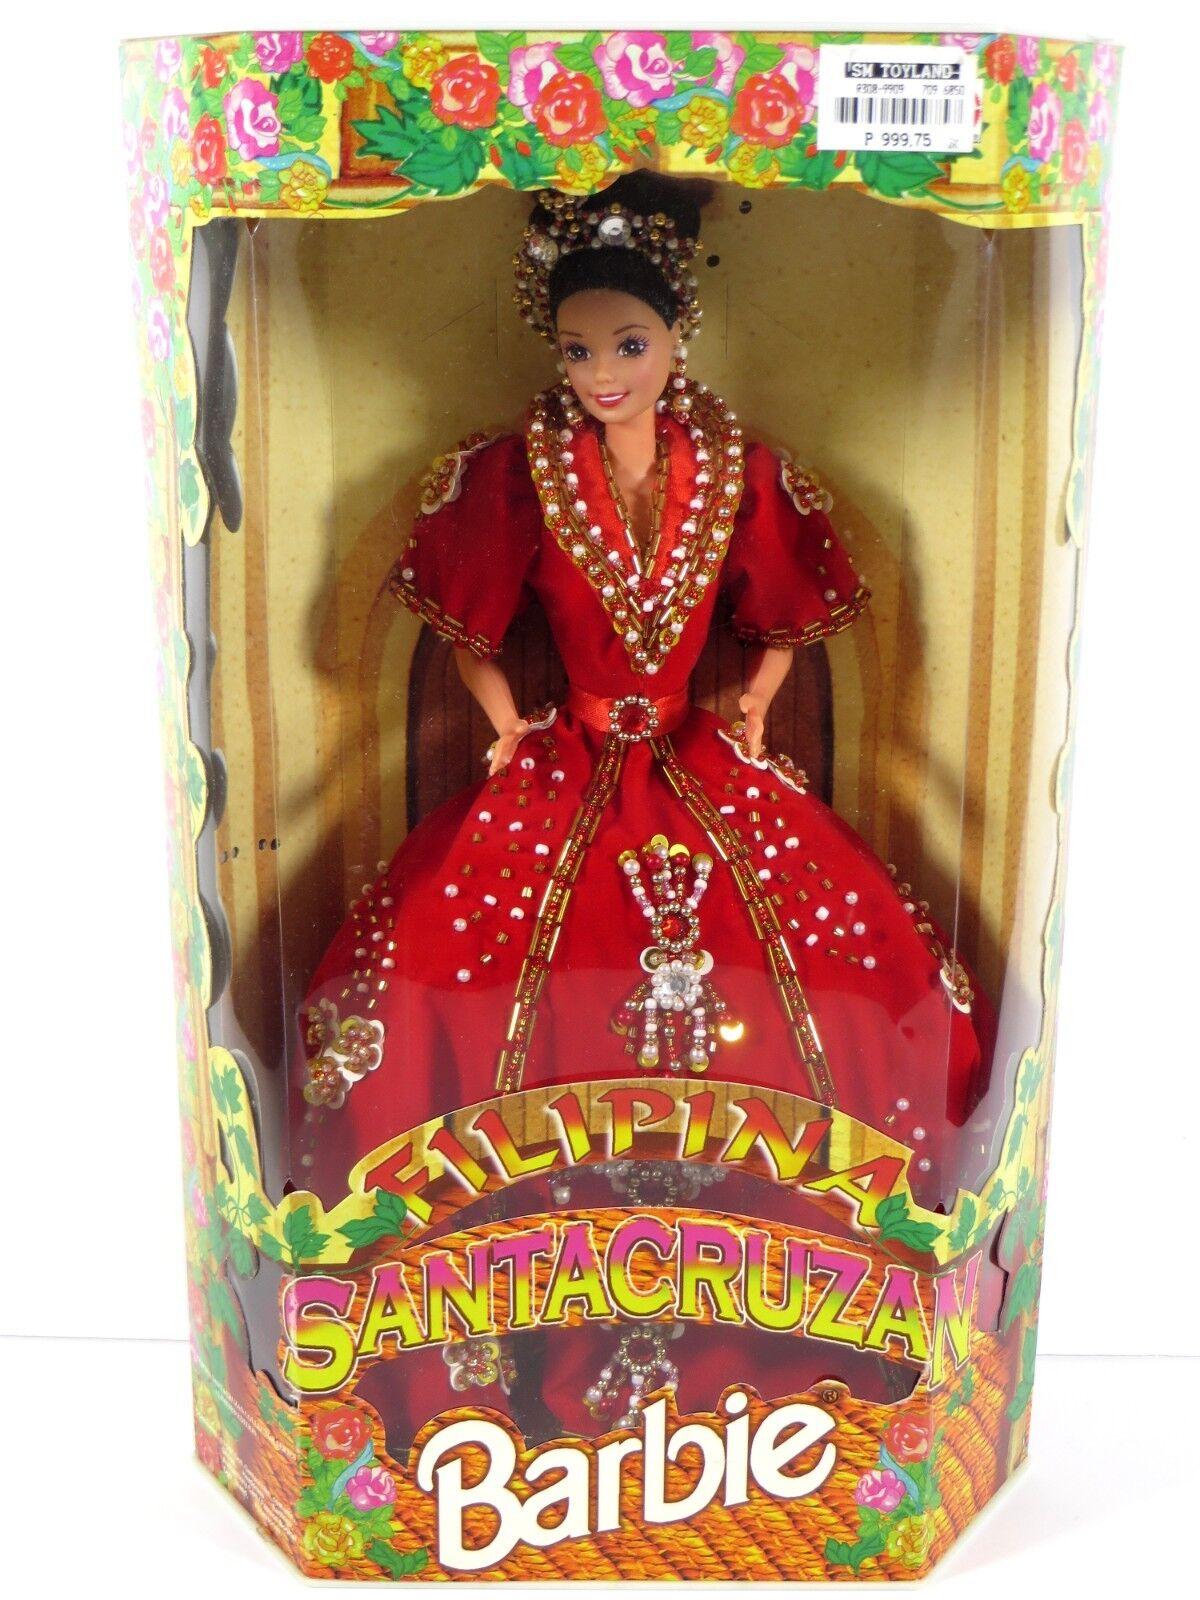 Nuevo en Caja Muñeca Barbie 1997  mercado extranjero Filipinas filipina santacruza